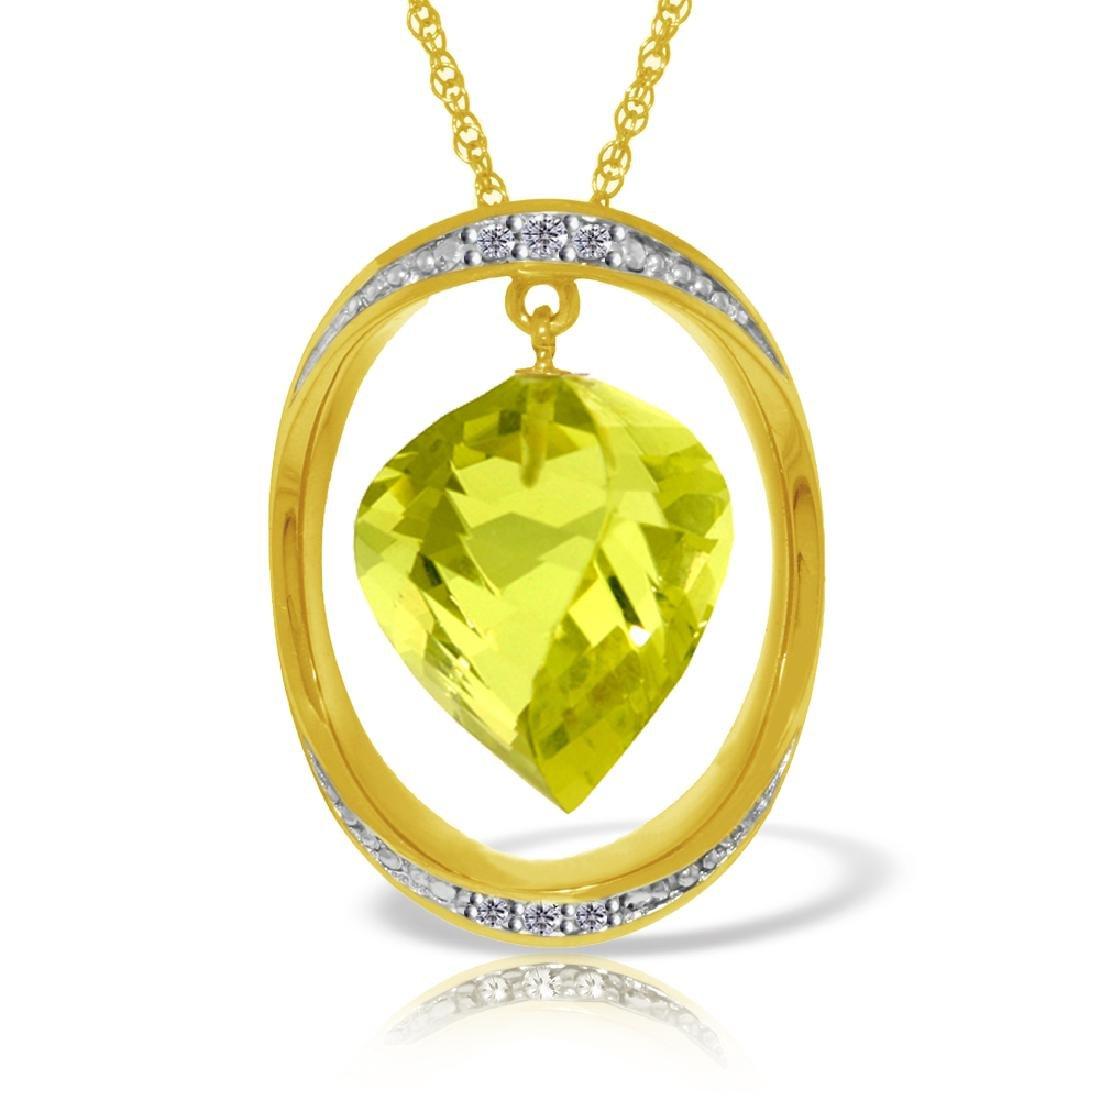 Genuine 10.85 ctw Lemon Quartz & Diamond Necklace